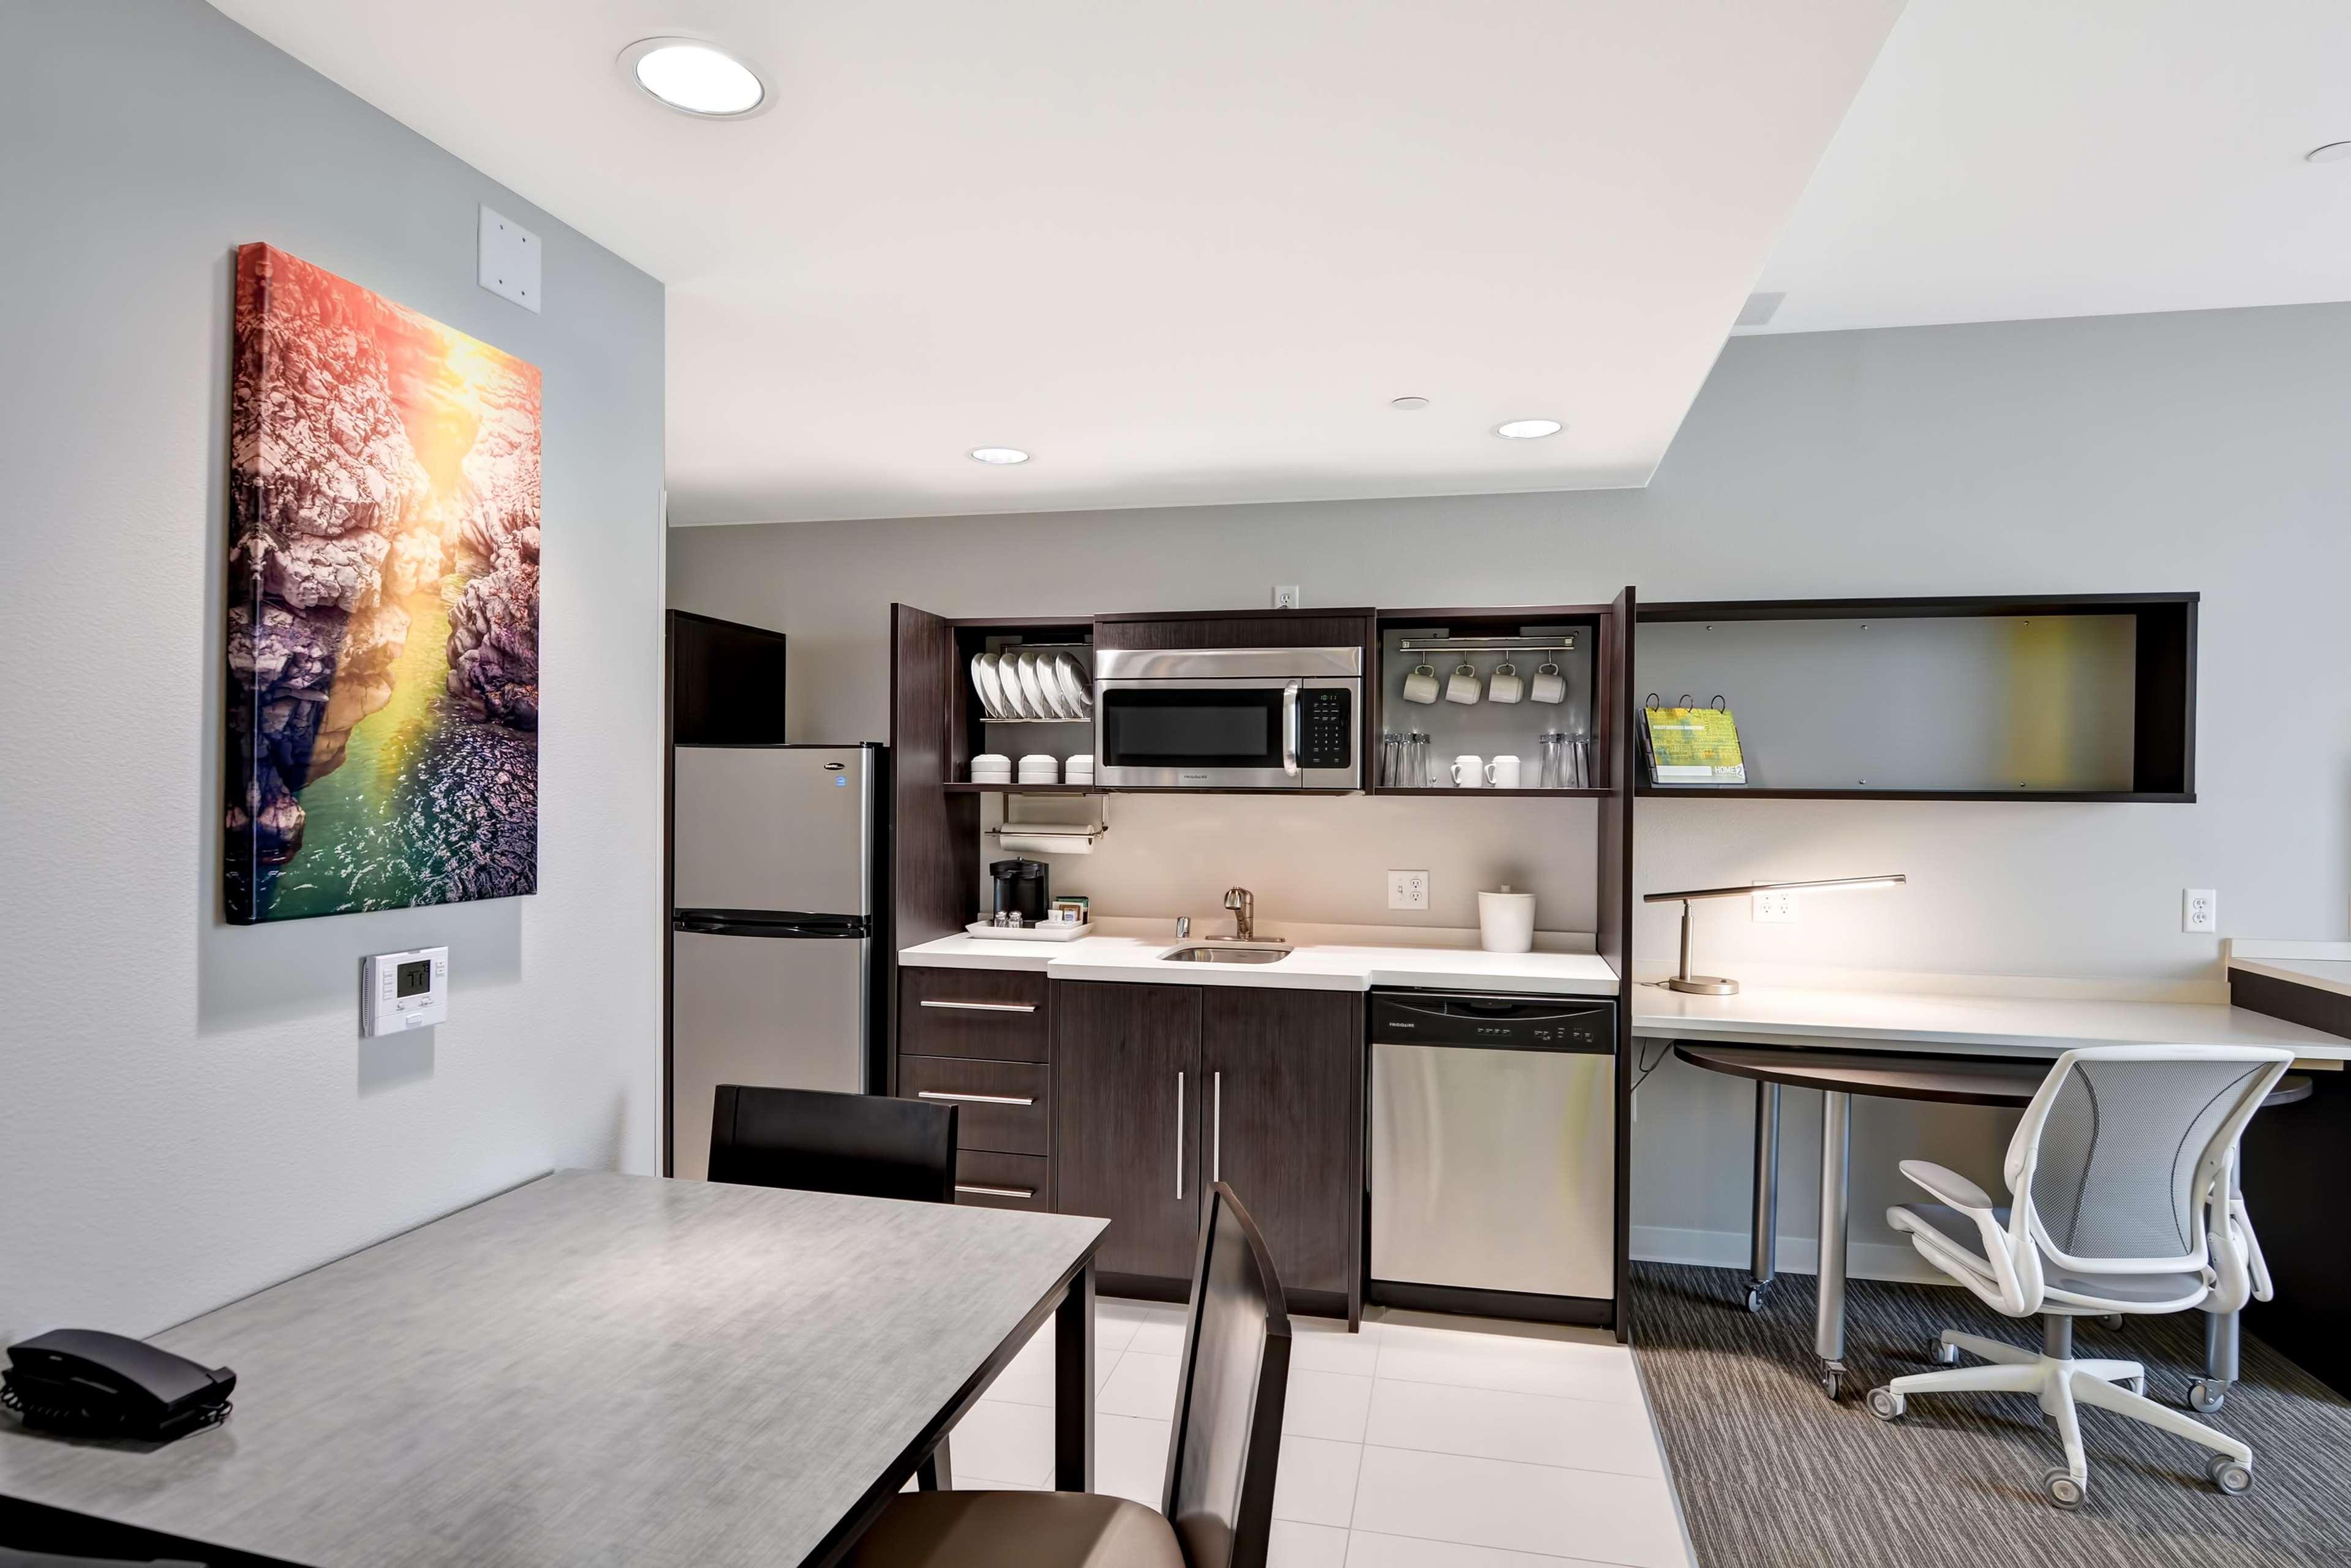 Home2 Suites by Hilton Azusa image 25